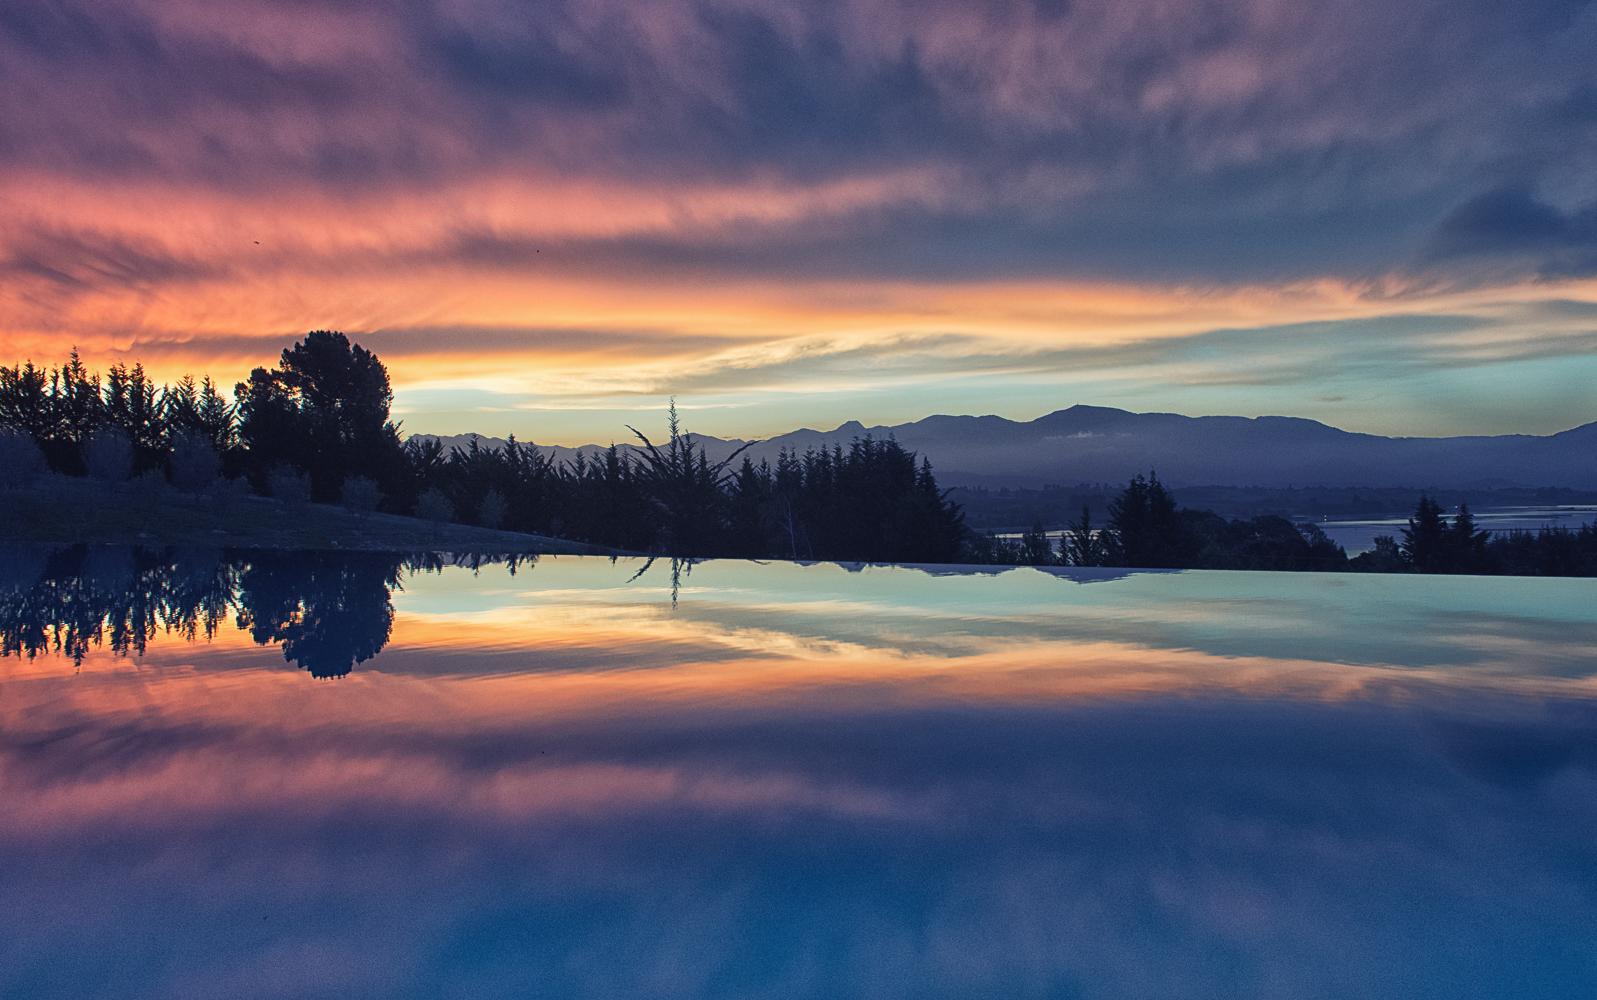 Mount Arthur mirror image, New Zealand